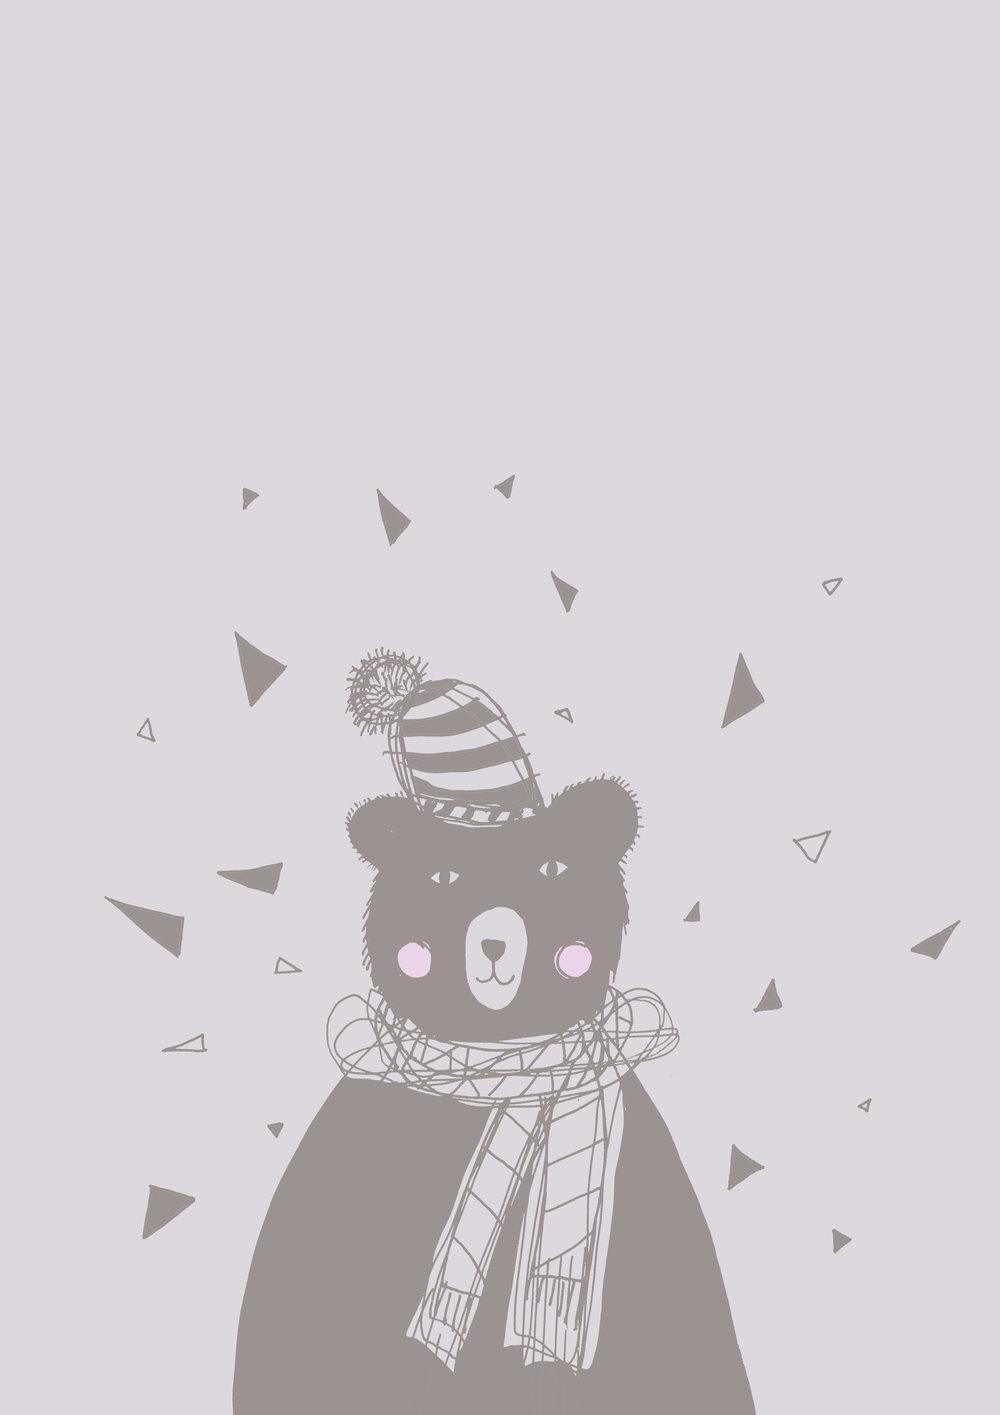 Cold bear free wallpaper download